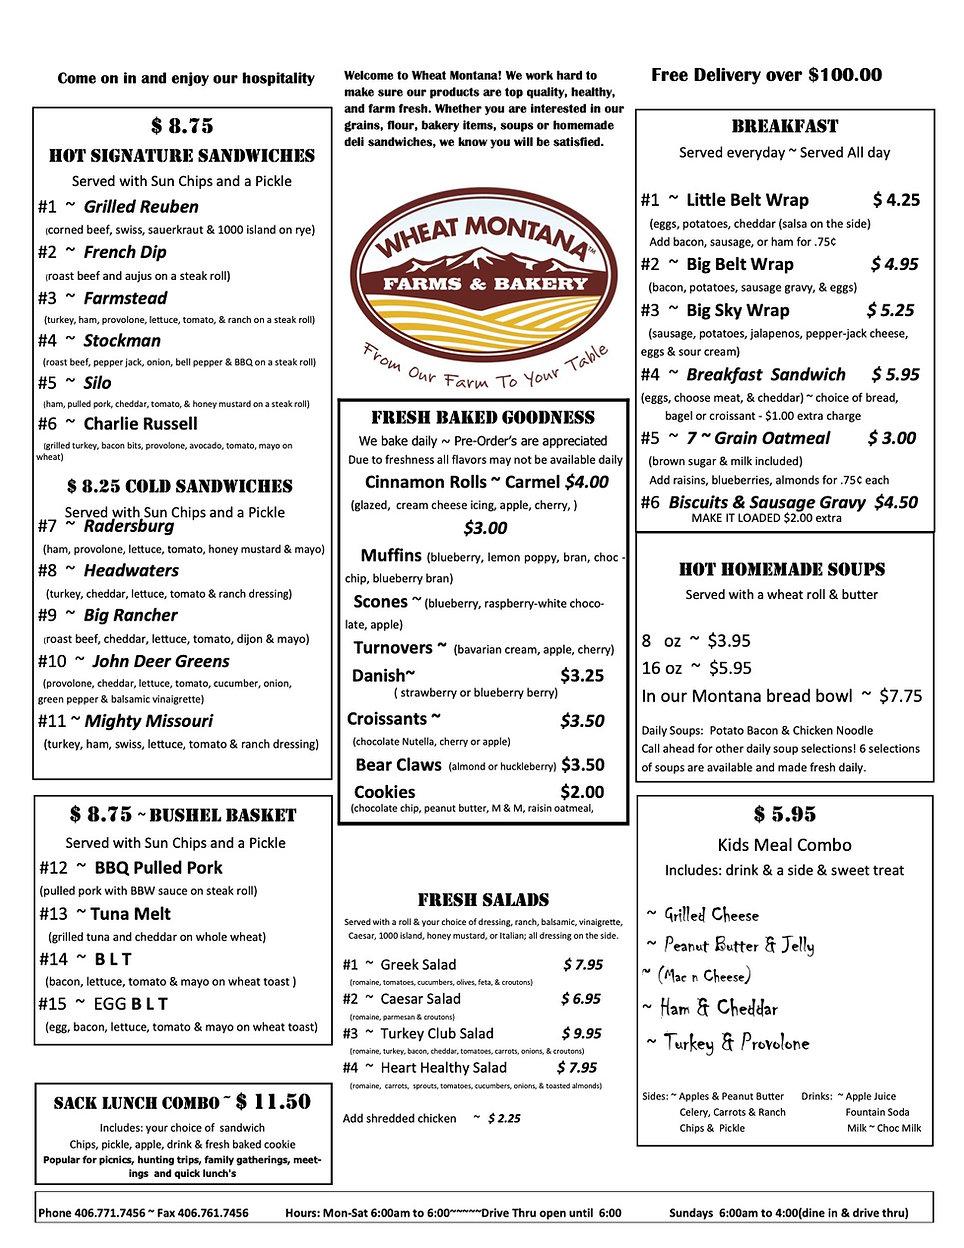 Menu-Wheat Montana Bakery & Deli.jpg